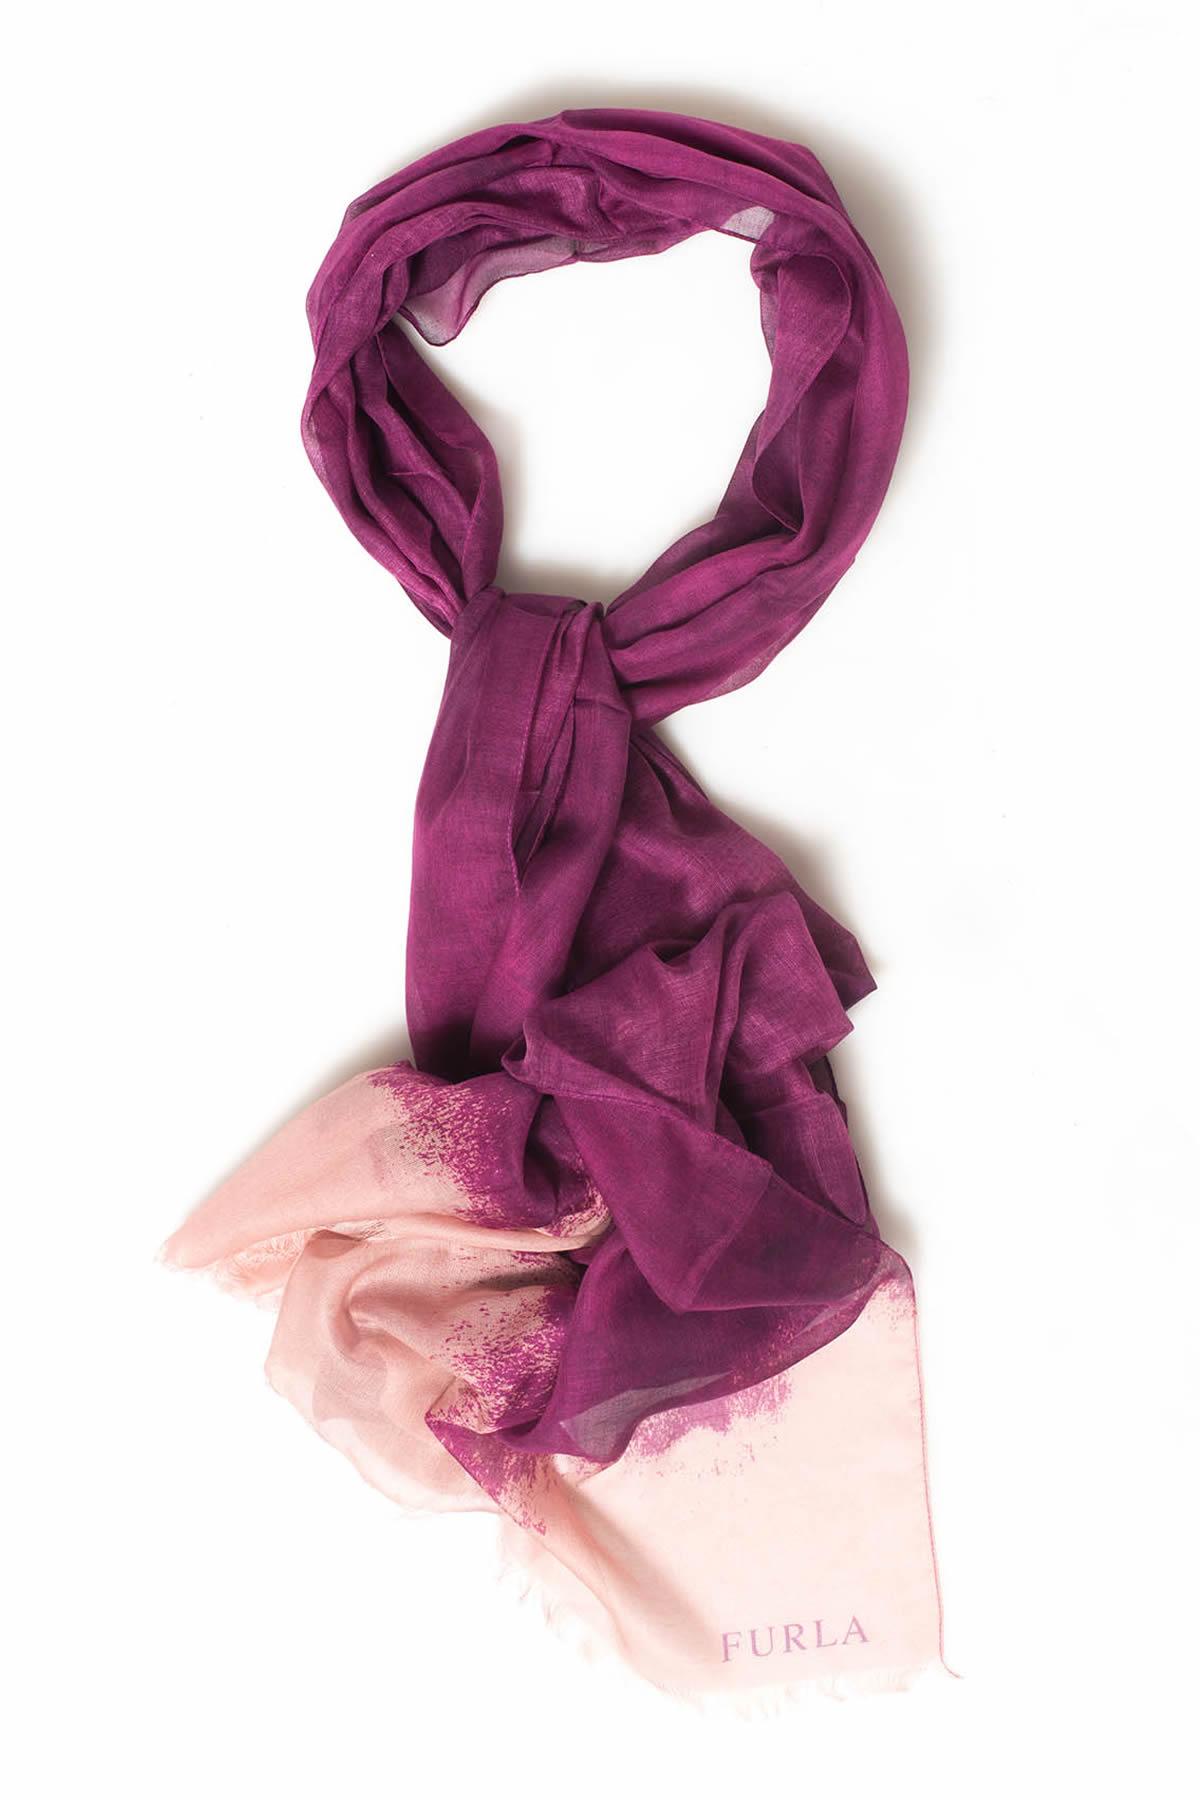 furla foulard viola modal donna